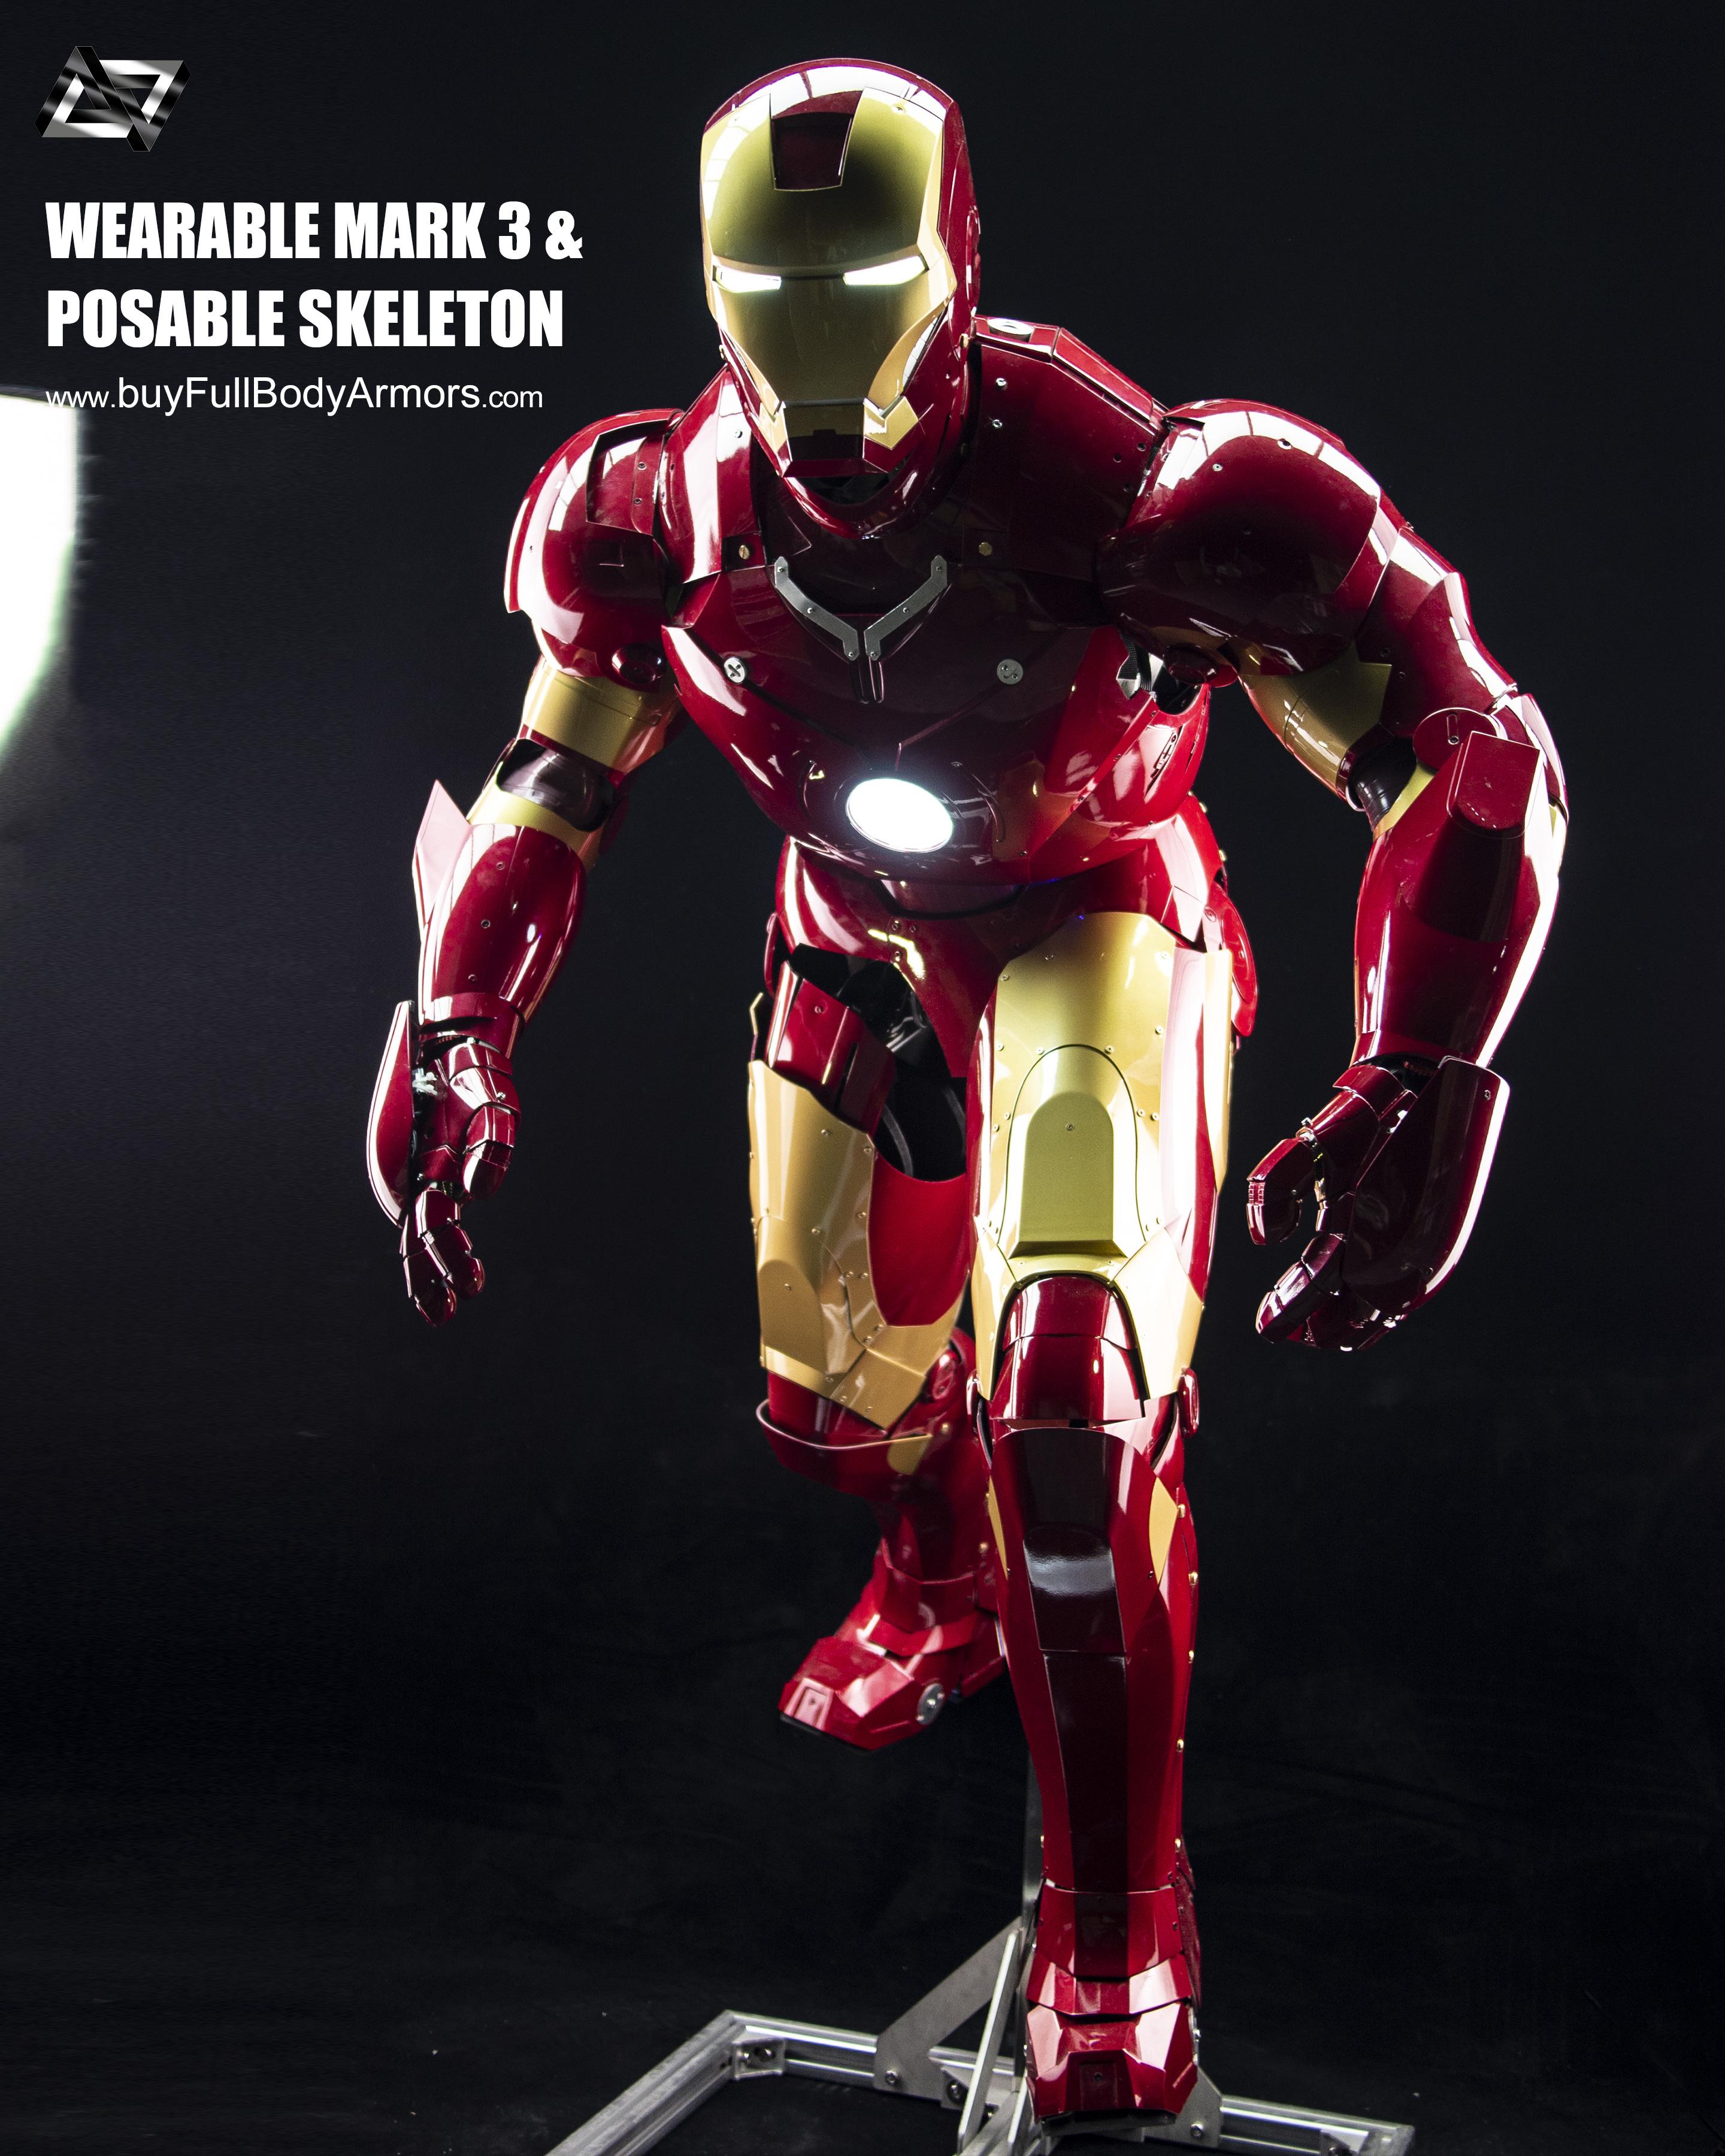 Iron Man Mark 3 III Armor Costume Suit Posable Skeleton Stand 2